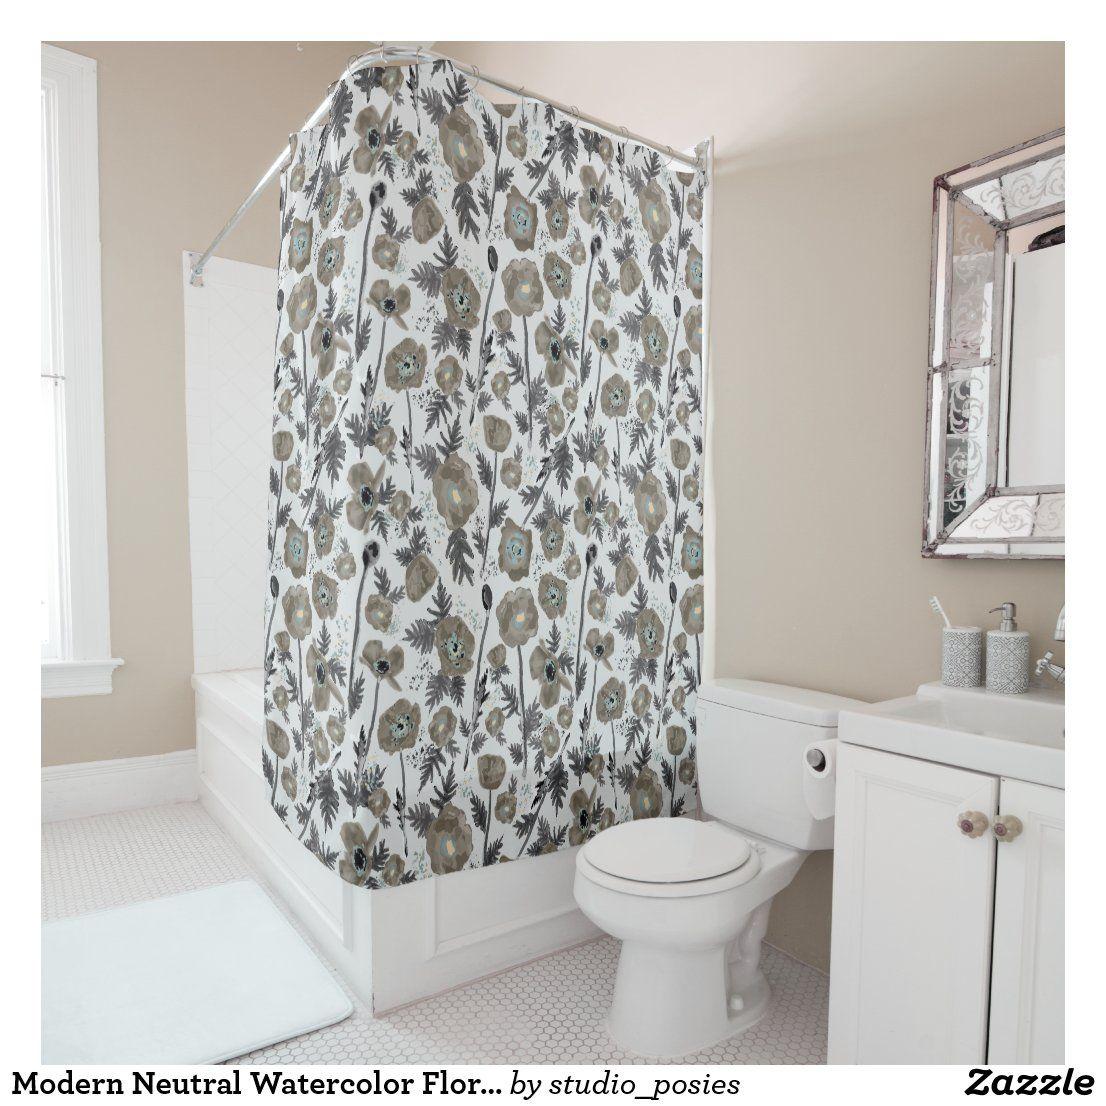 Modern Neutral Watercolor Floral Pattern Shower Curtain | Zazzle.com